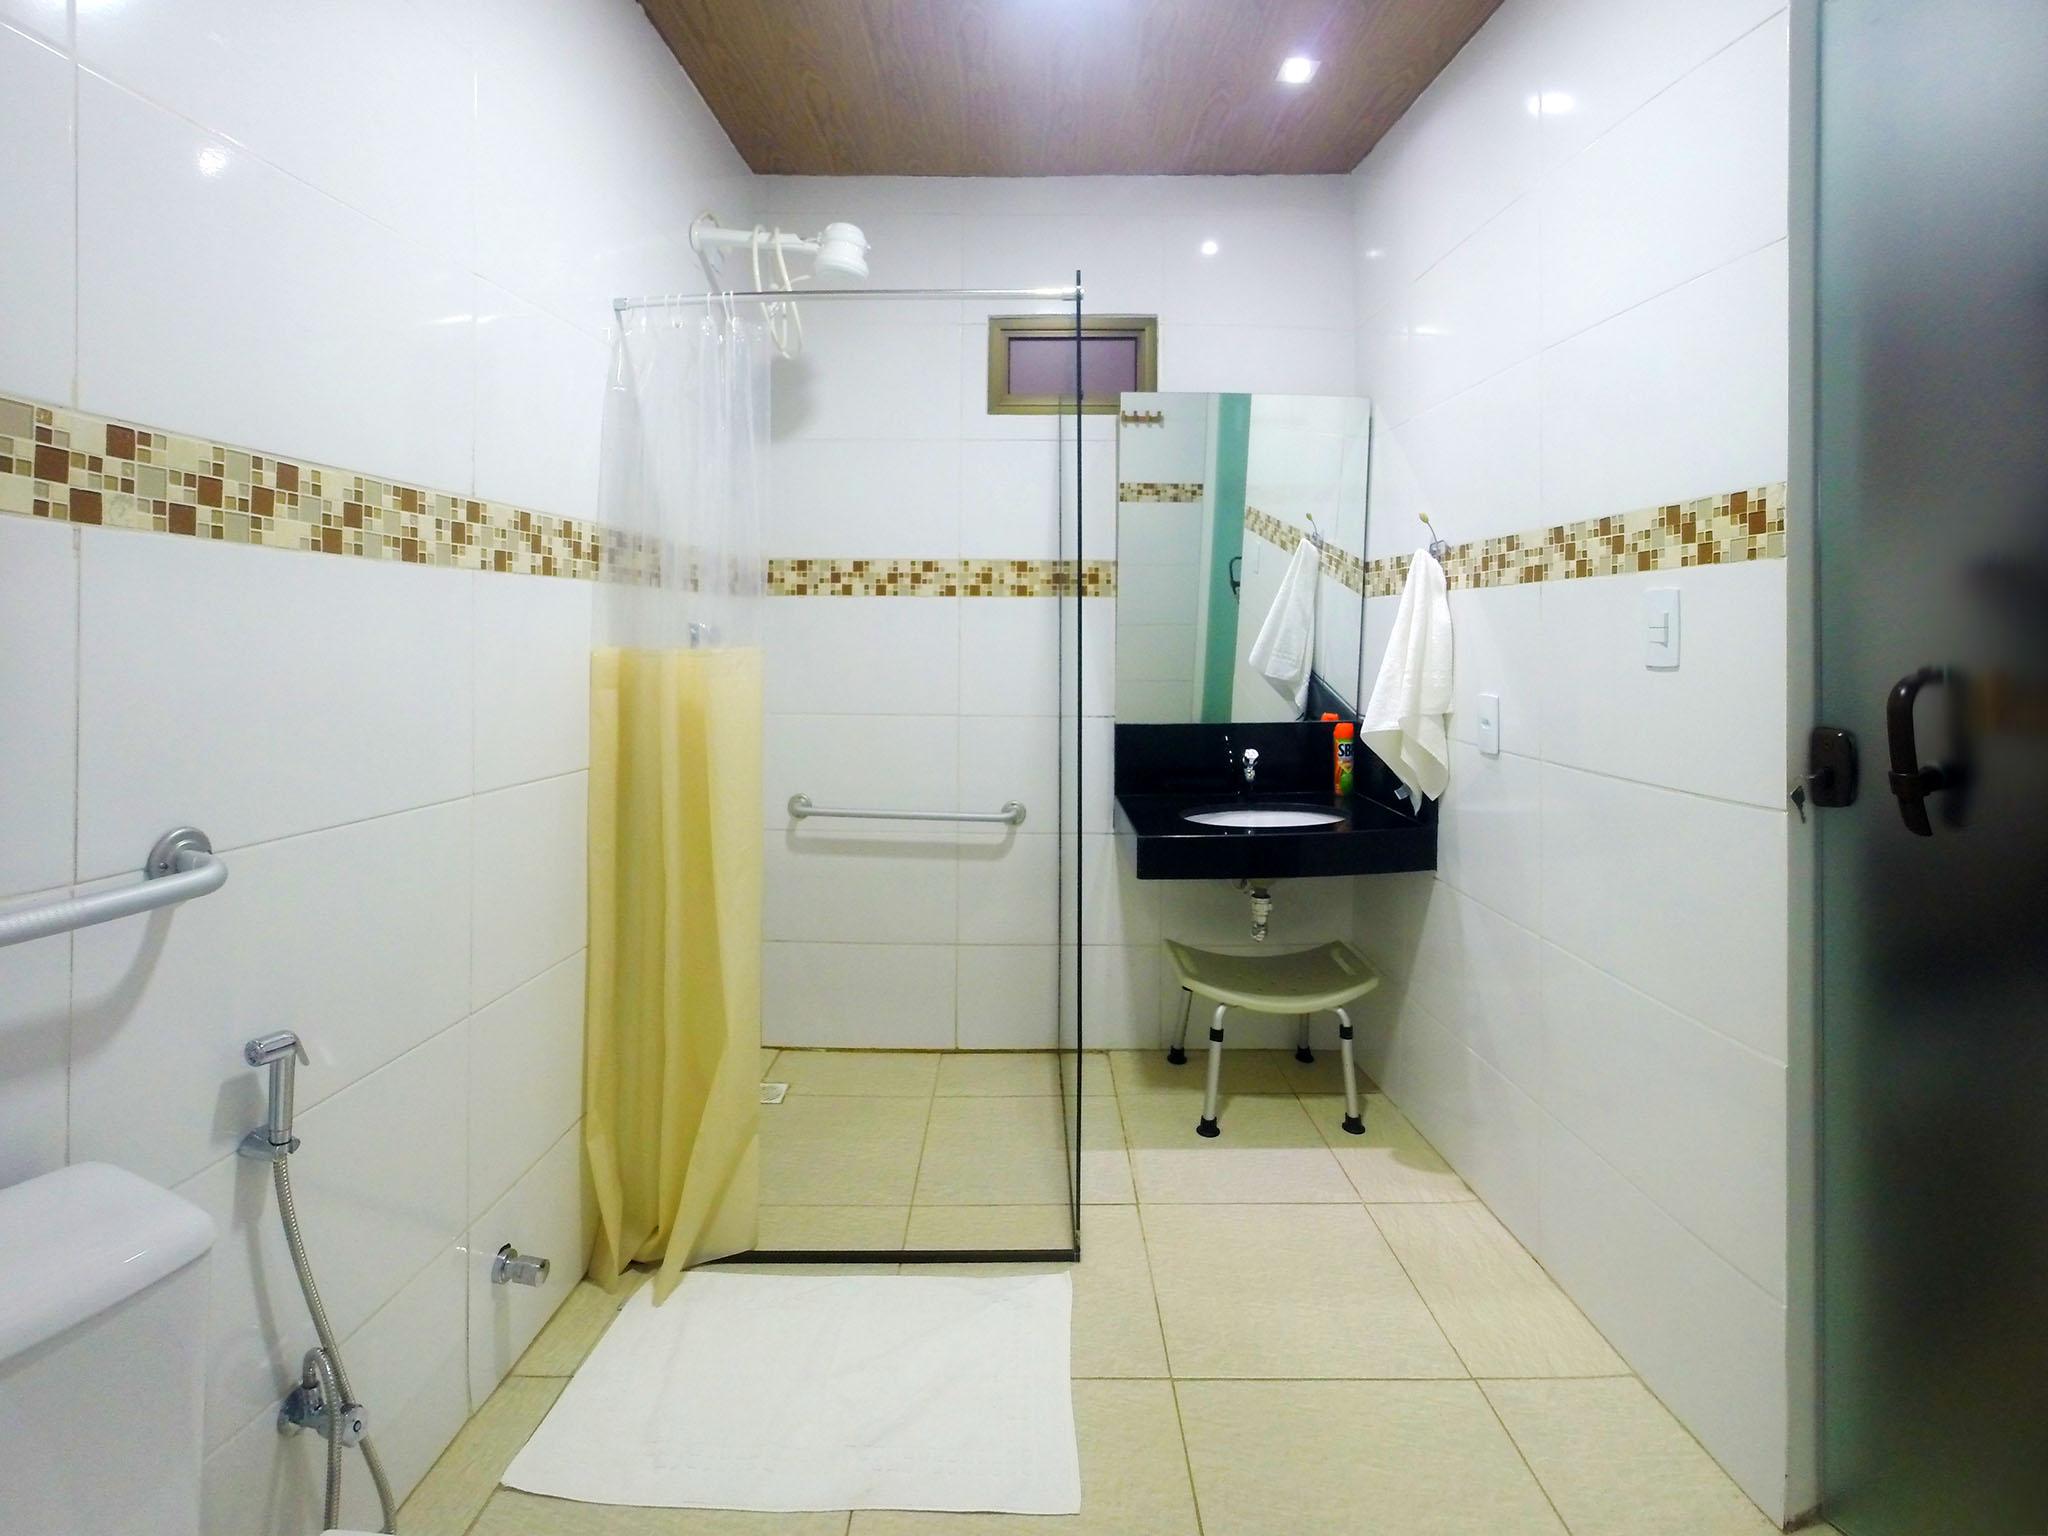 Suíte PNE Pousada Aconchego #827941 2048x1536 Banheiro Adaptado Restaurante